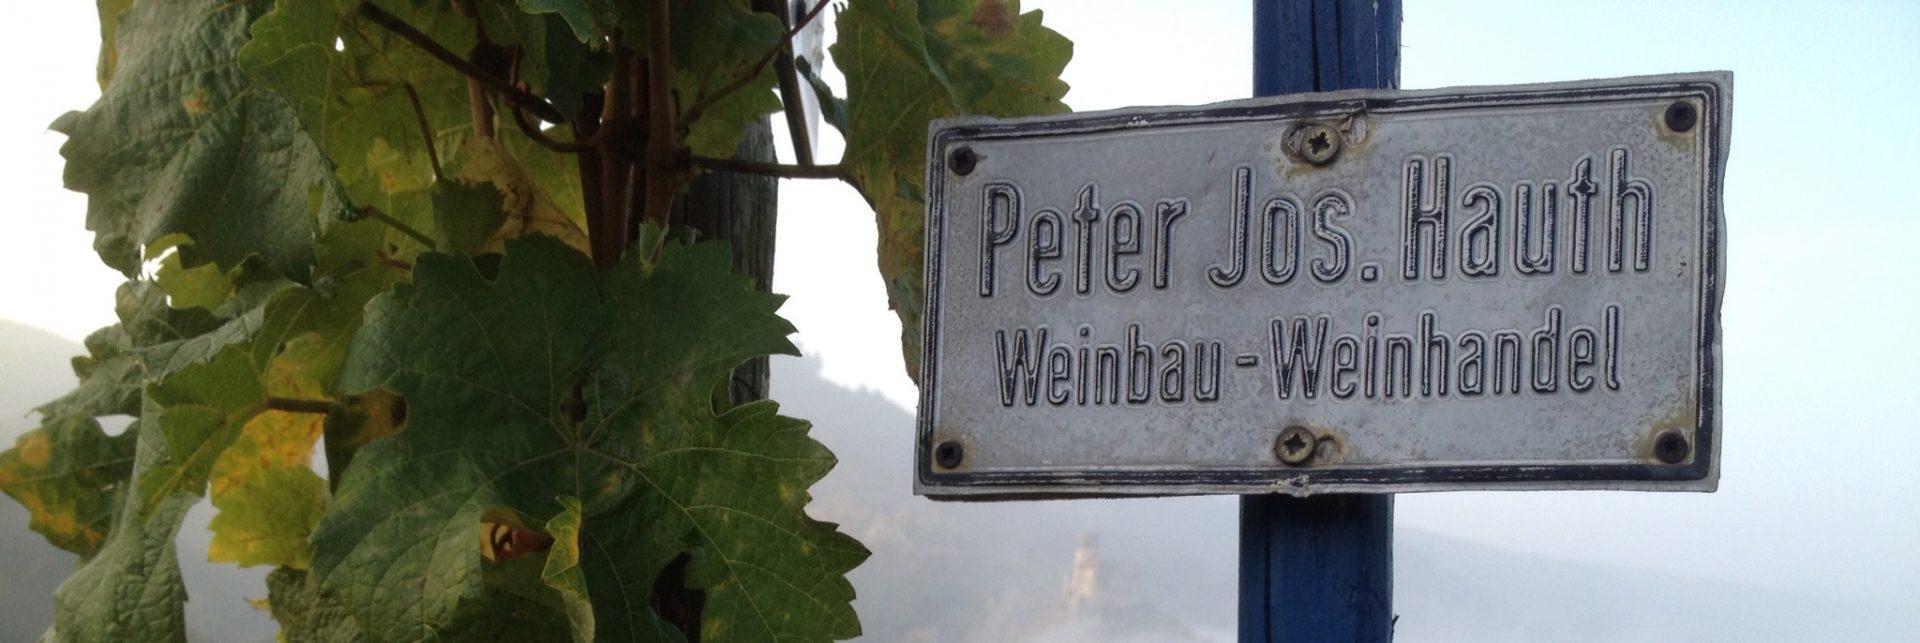 Weingut Hauth